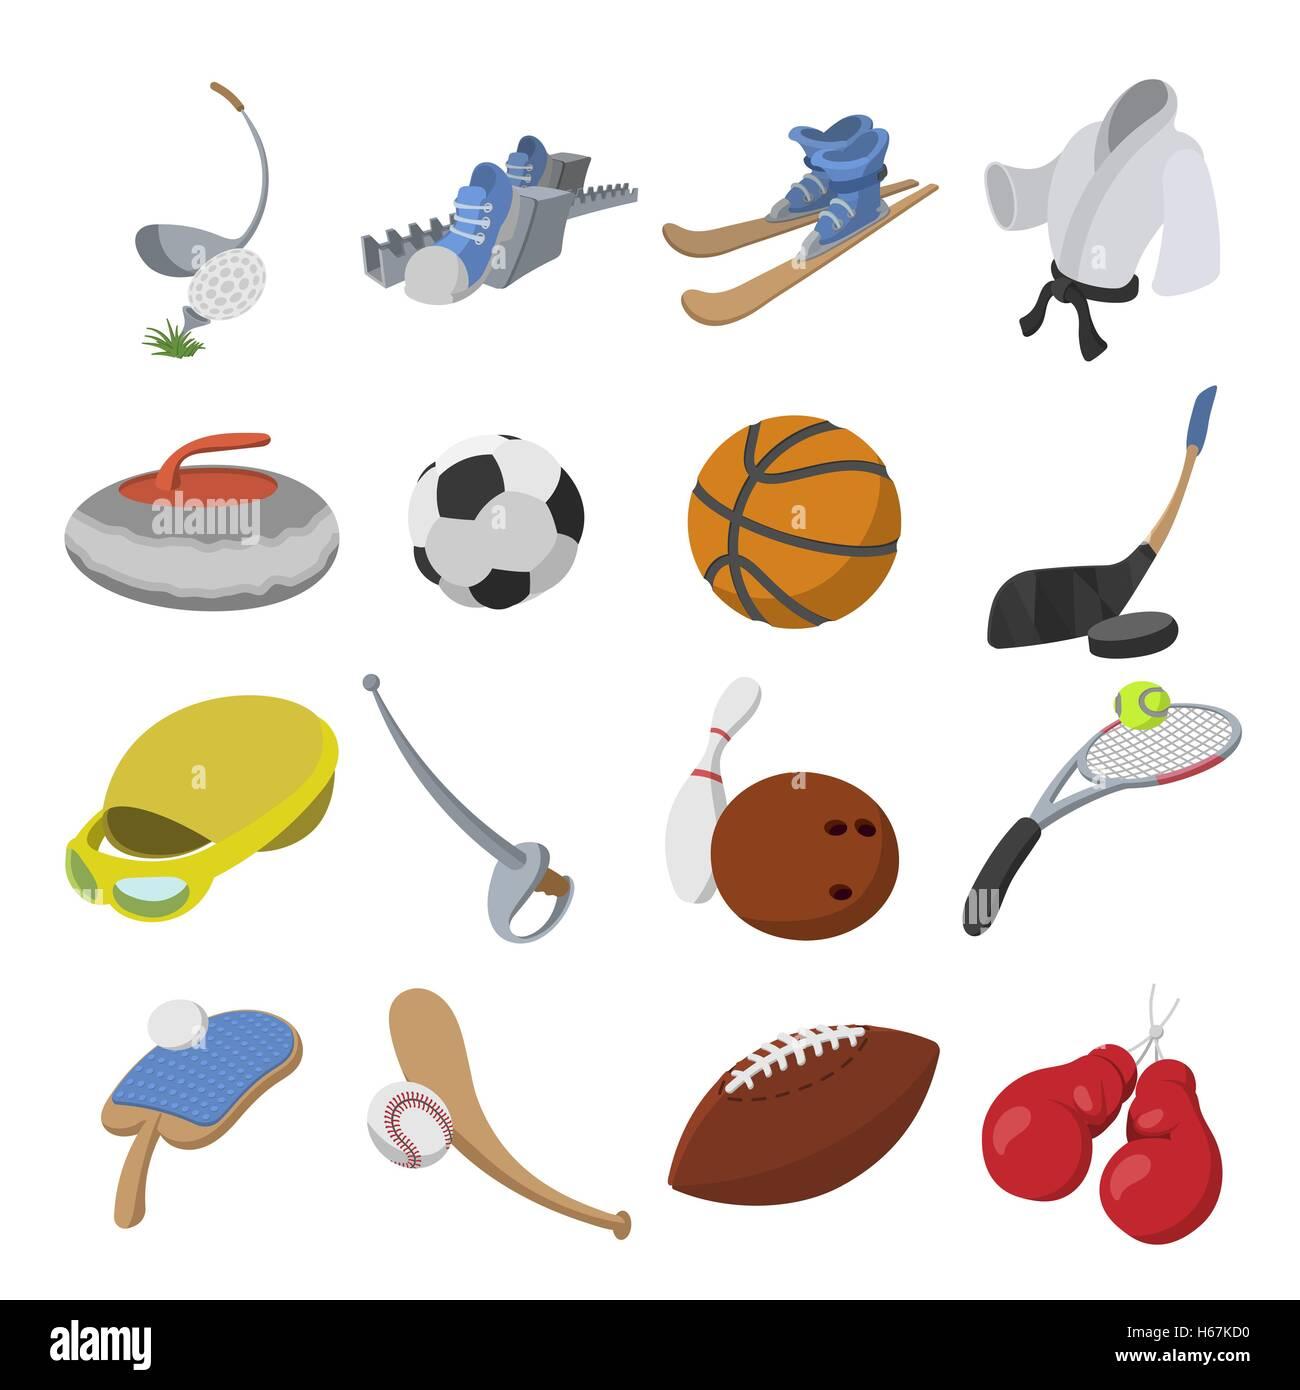 Tennis Cartoon Imágenes De Stock   Tennis Cartoon Fotos De Stock ... 5204c923f6bce